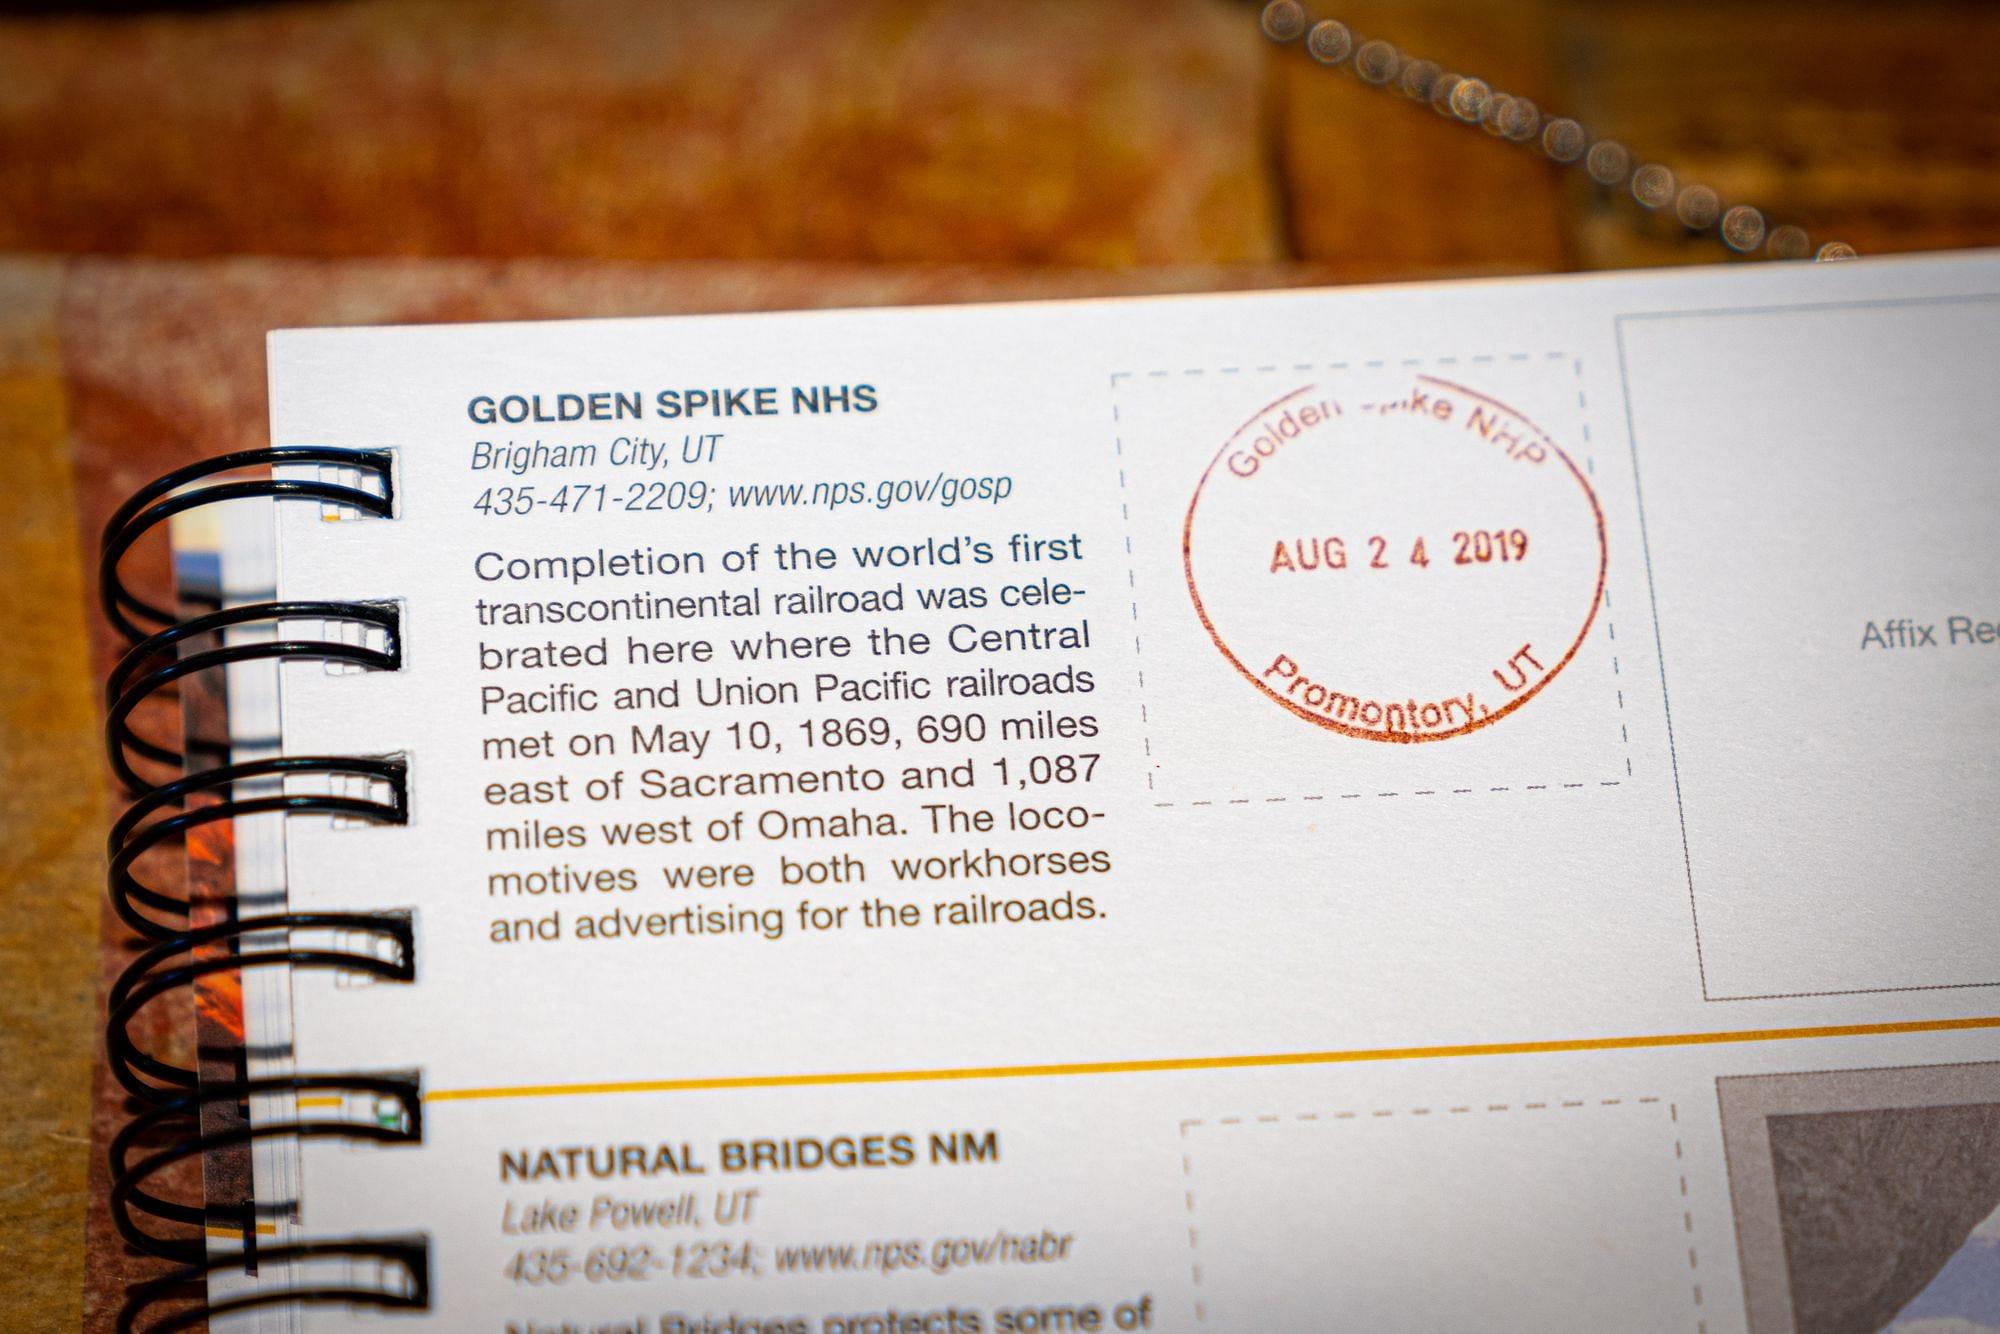 Golden Spike National Historical Park Passport Stamp